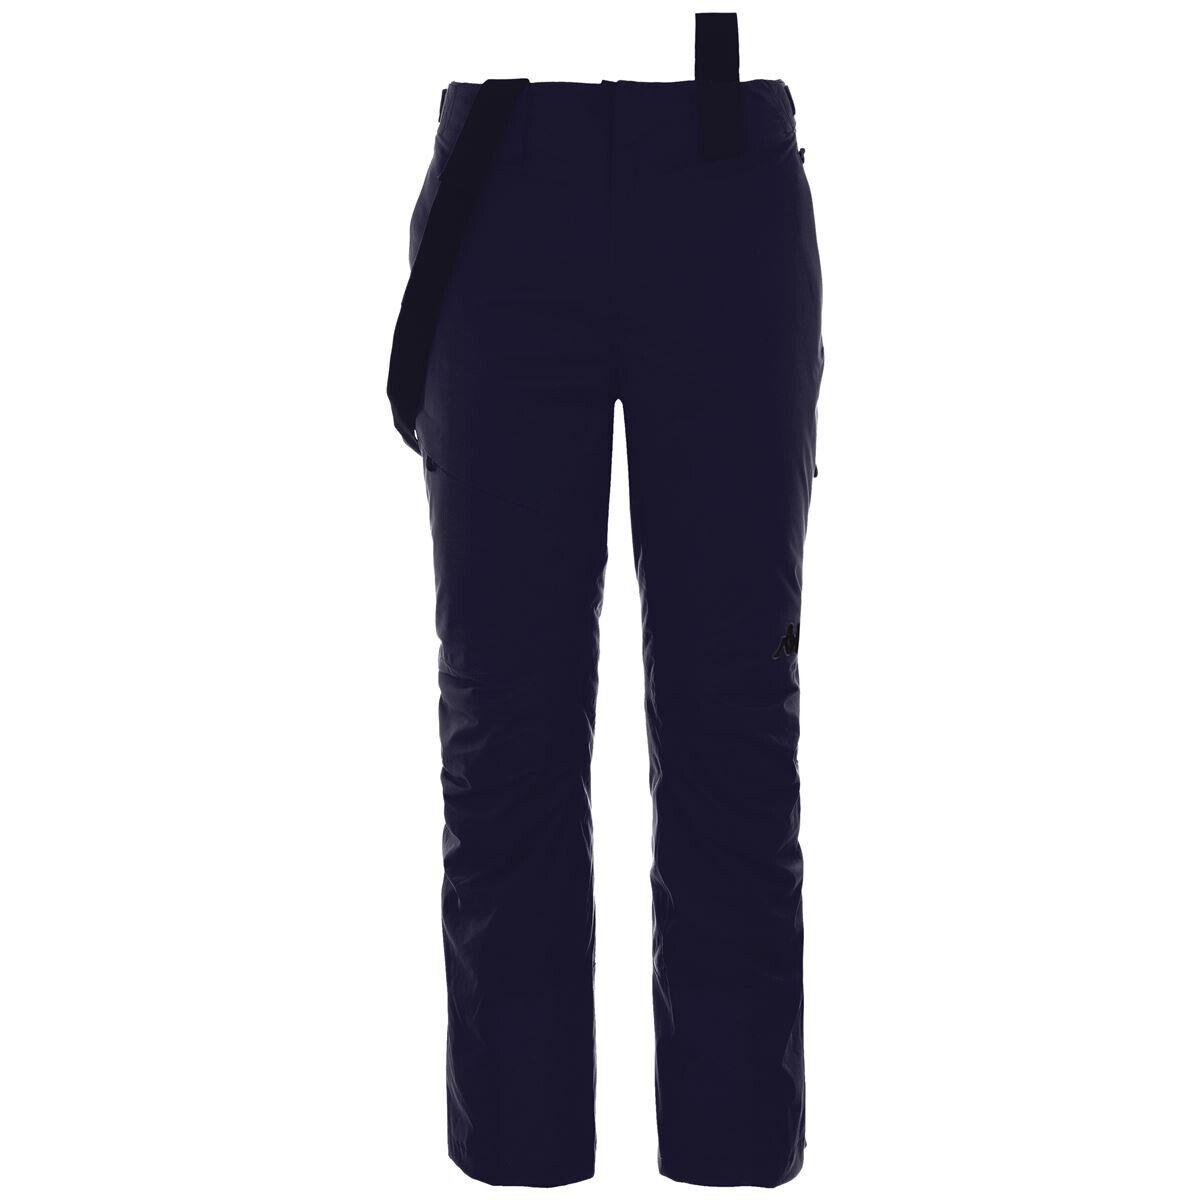 Kappa Pantalone da Sci Uomo 6Cento 622A Blu Codice 303PBZ0919  9M